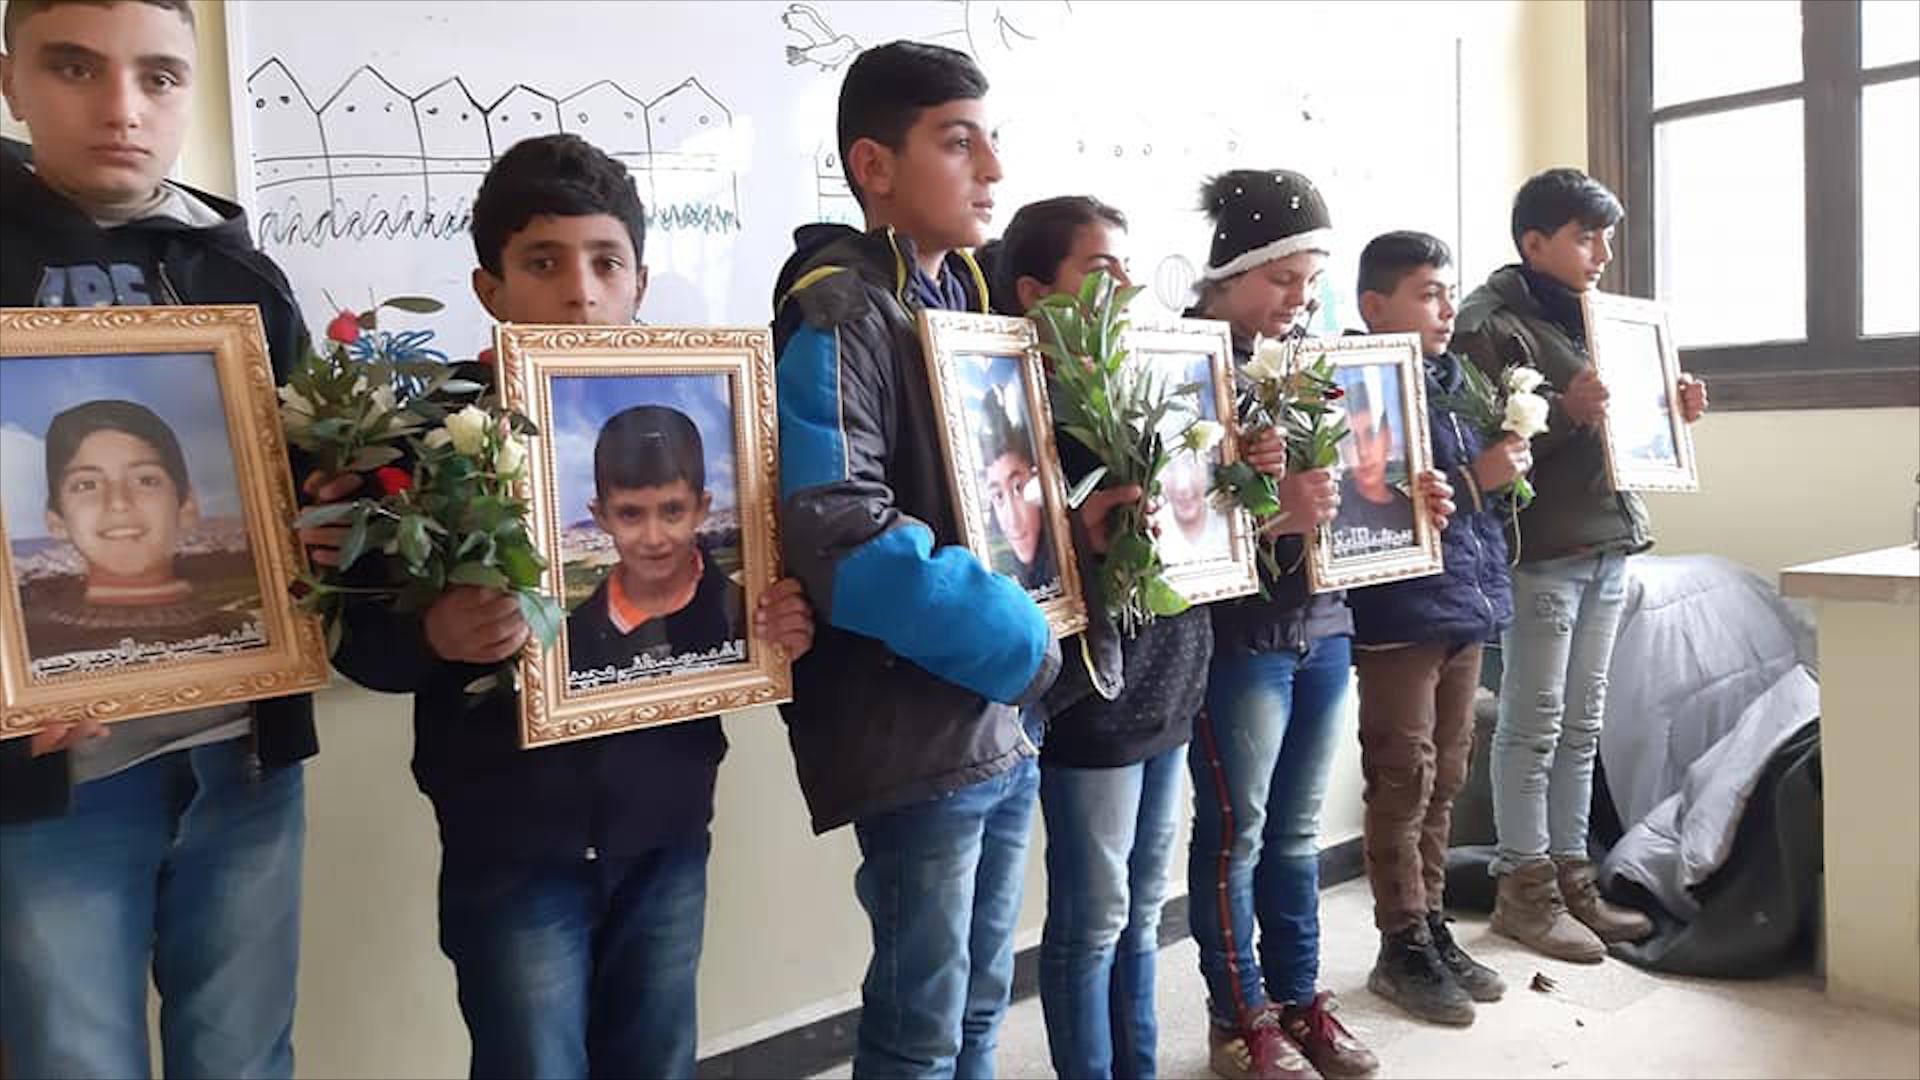 Photo of مجزرة تل رفعت الطلبة يضعون الورود على المقاعد الدراسية لشهداء المجزرة